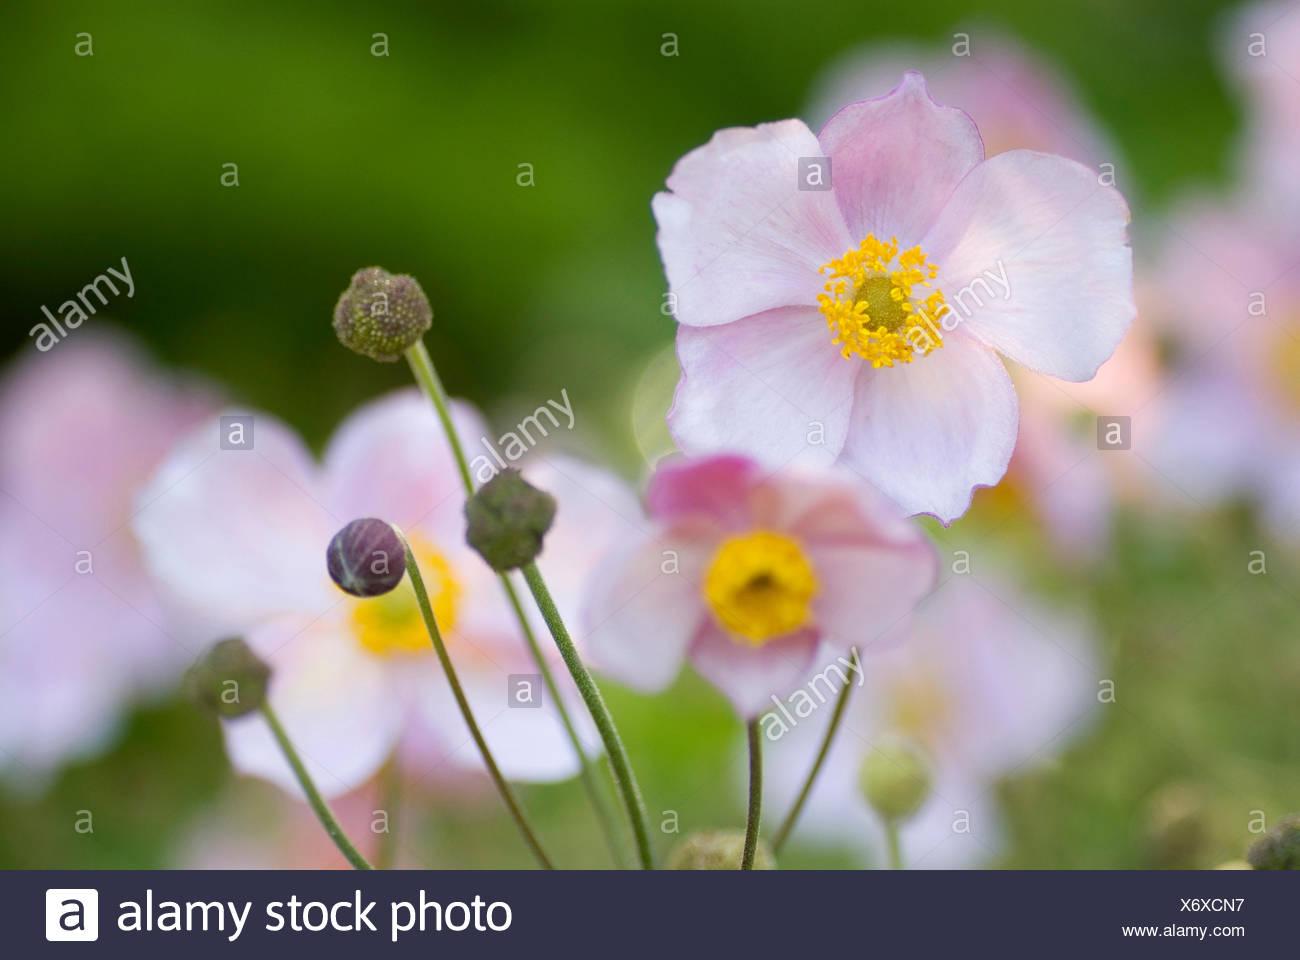 Japanese anemone, Japanese Windflower (Anemone japonica, Anemone hupehensis var. japonica), flowers Stock Photo